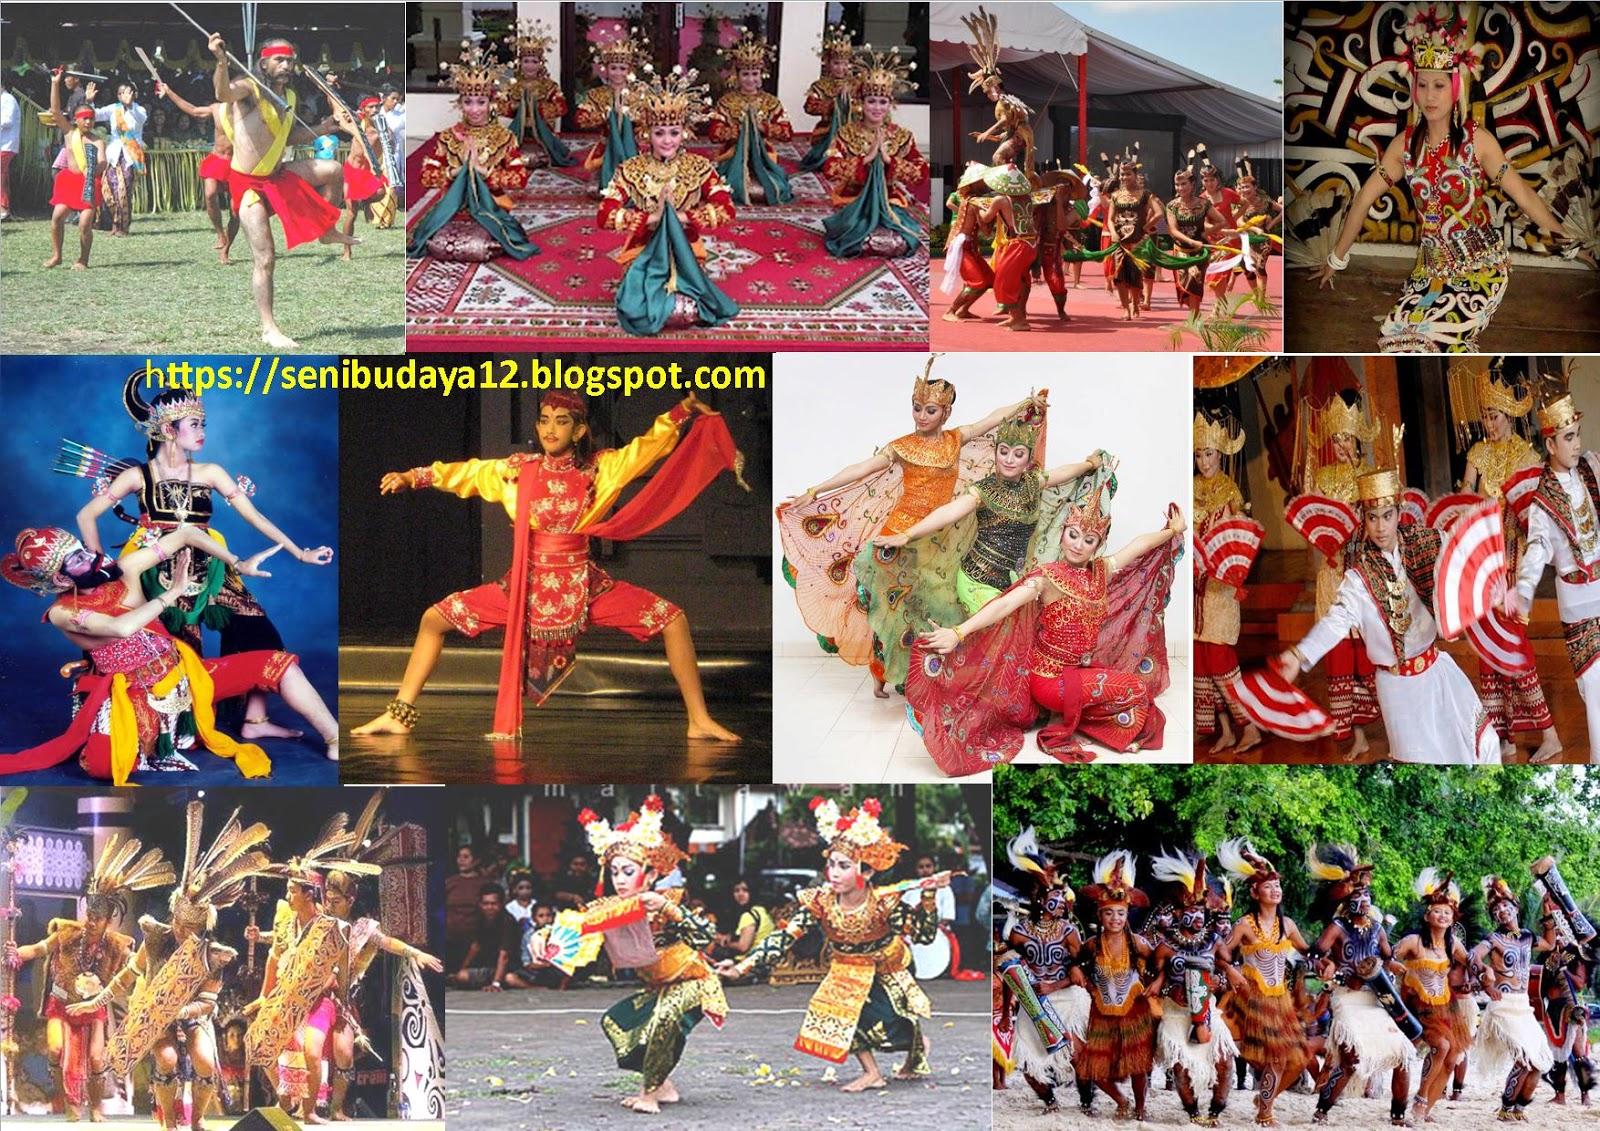 Seni Budaya Kliping Gambar Tari Tradisional Adat Suku Daerah Di 34 Provinsi